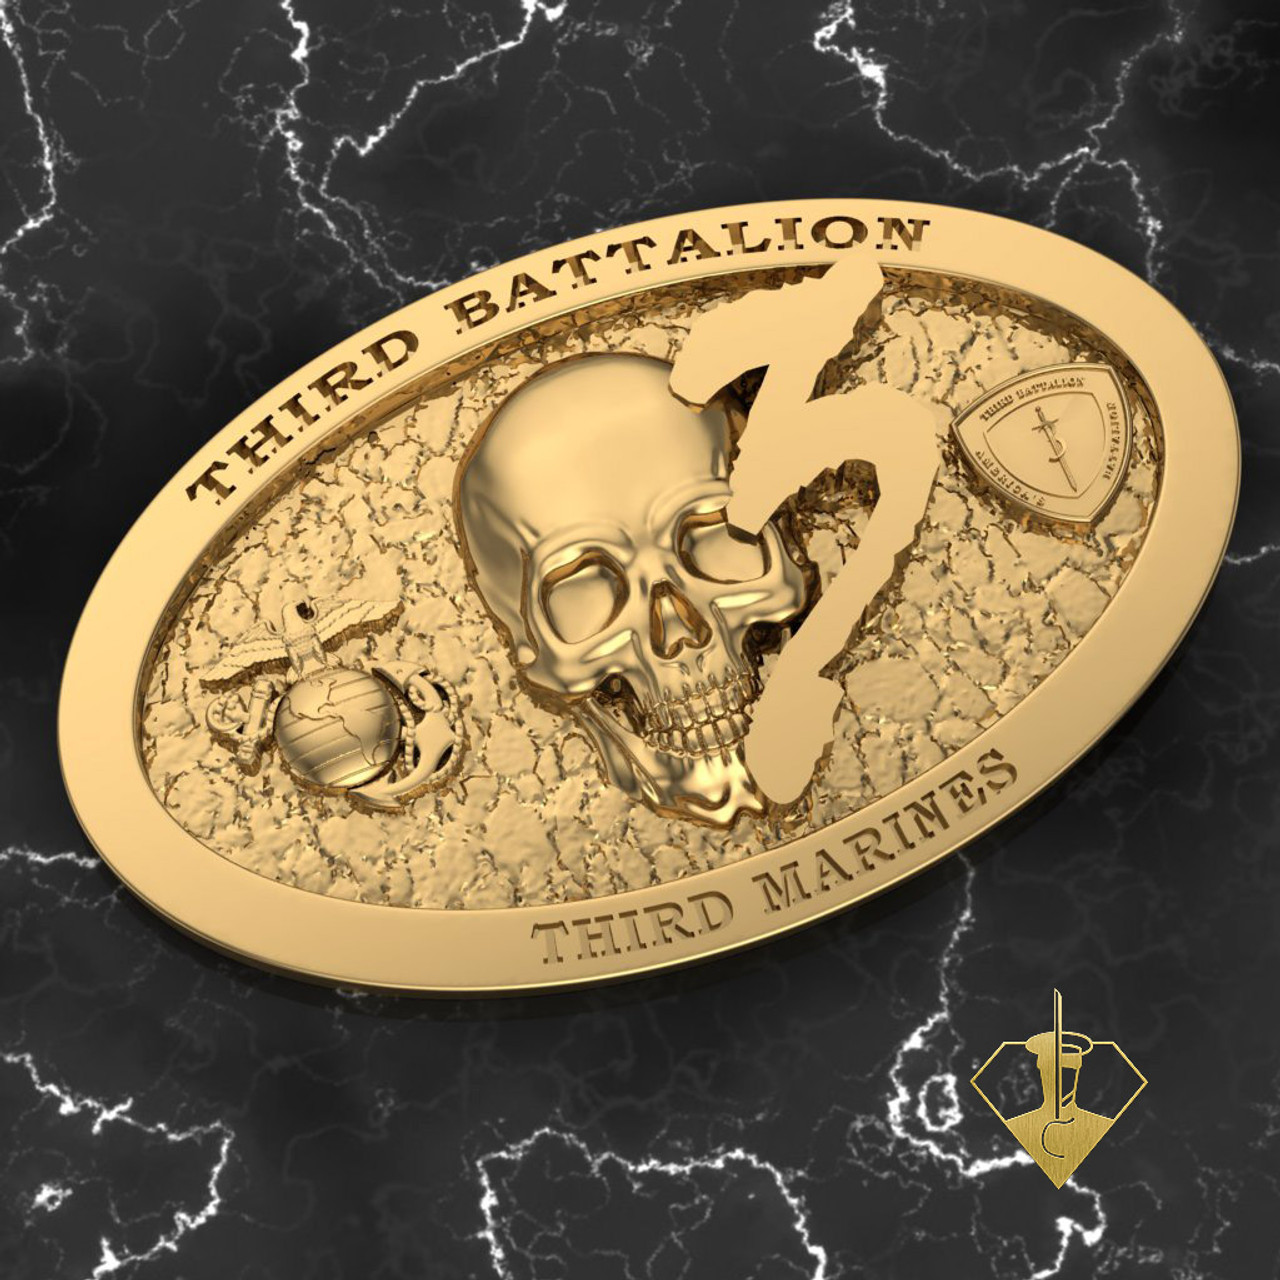 3rd Battalion 3rd Marines Solid Brass Belt Buckle